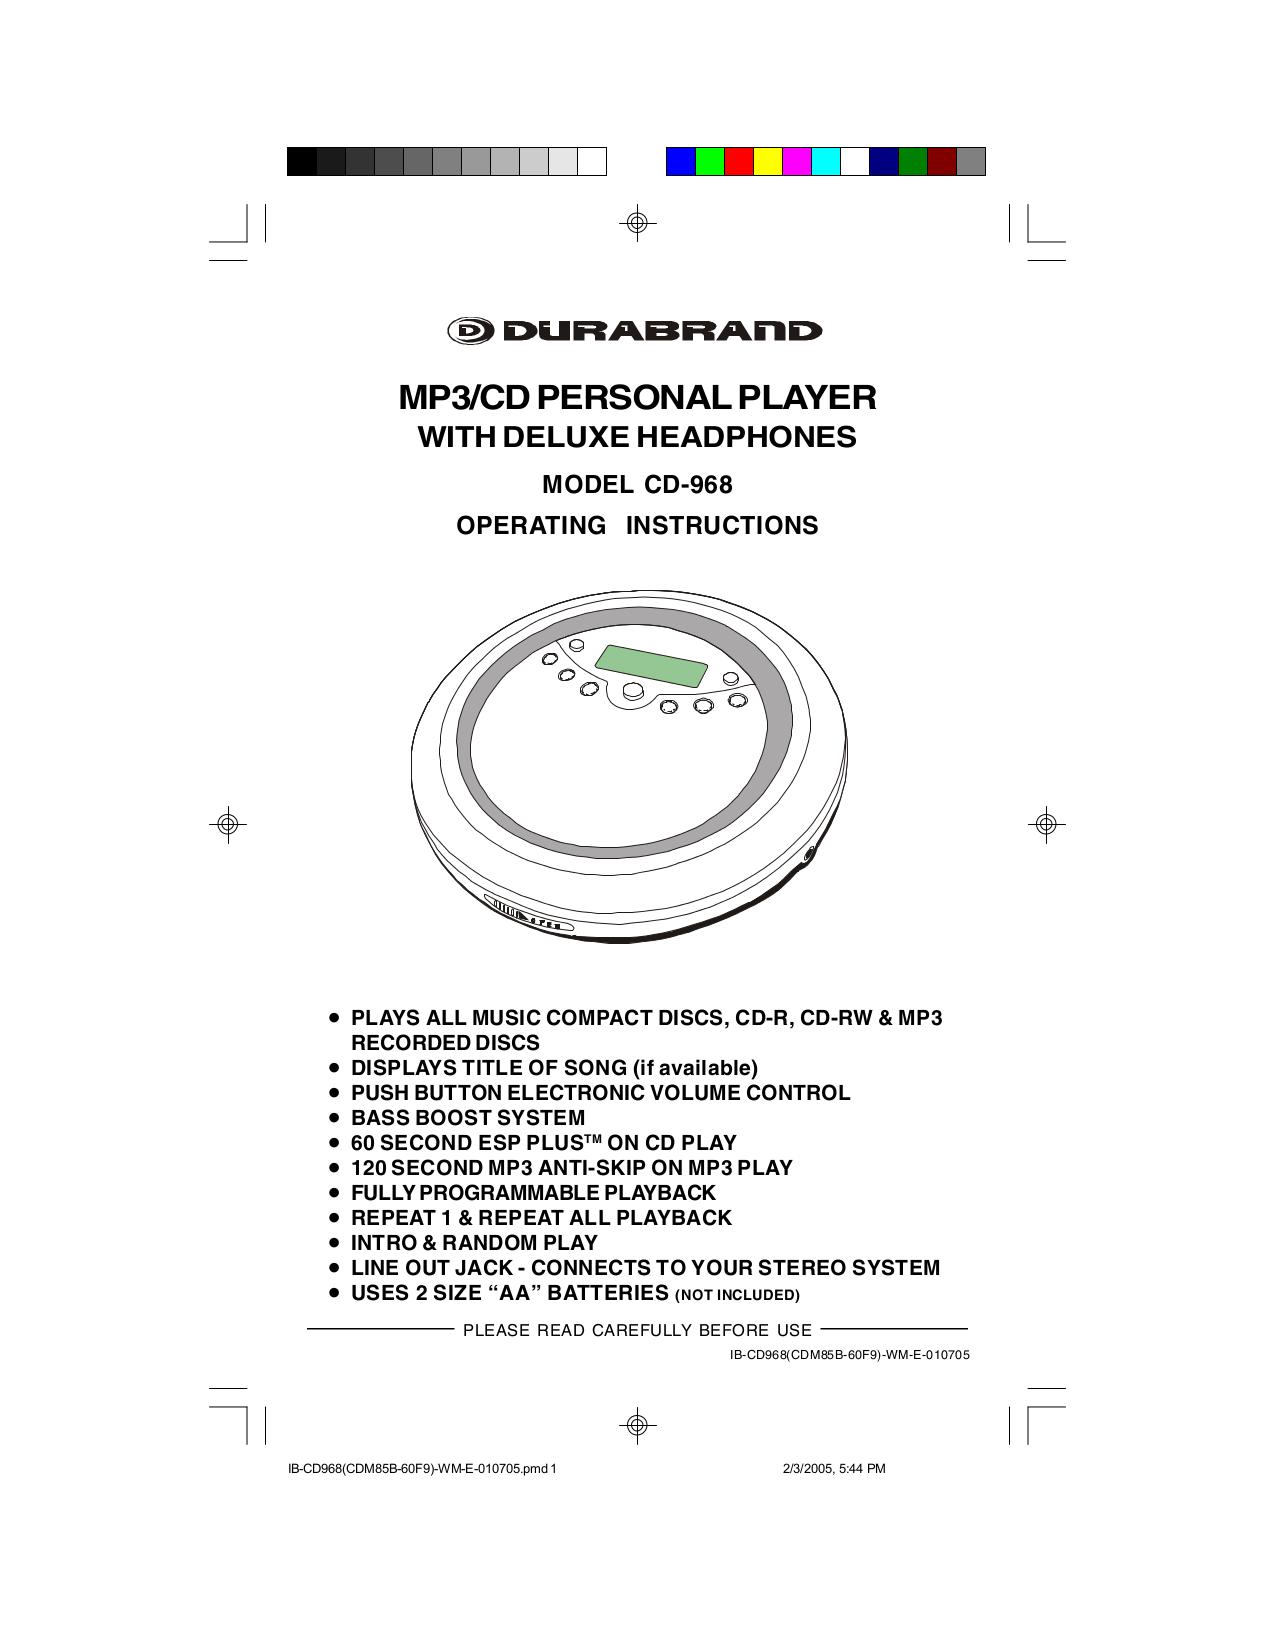 pdf for Lenoxx CD Player CD-968 manual